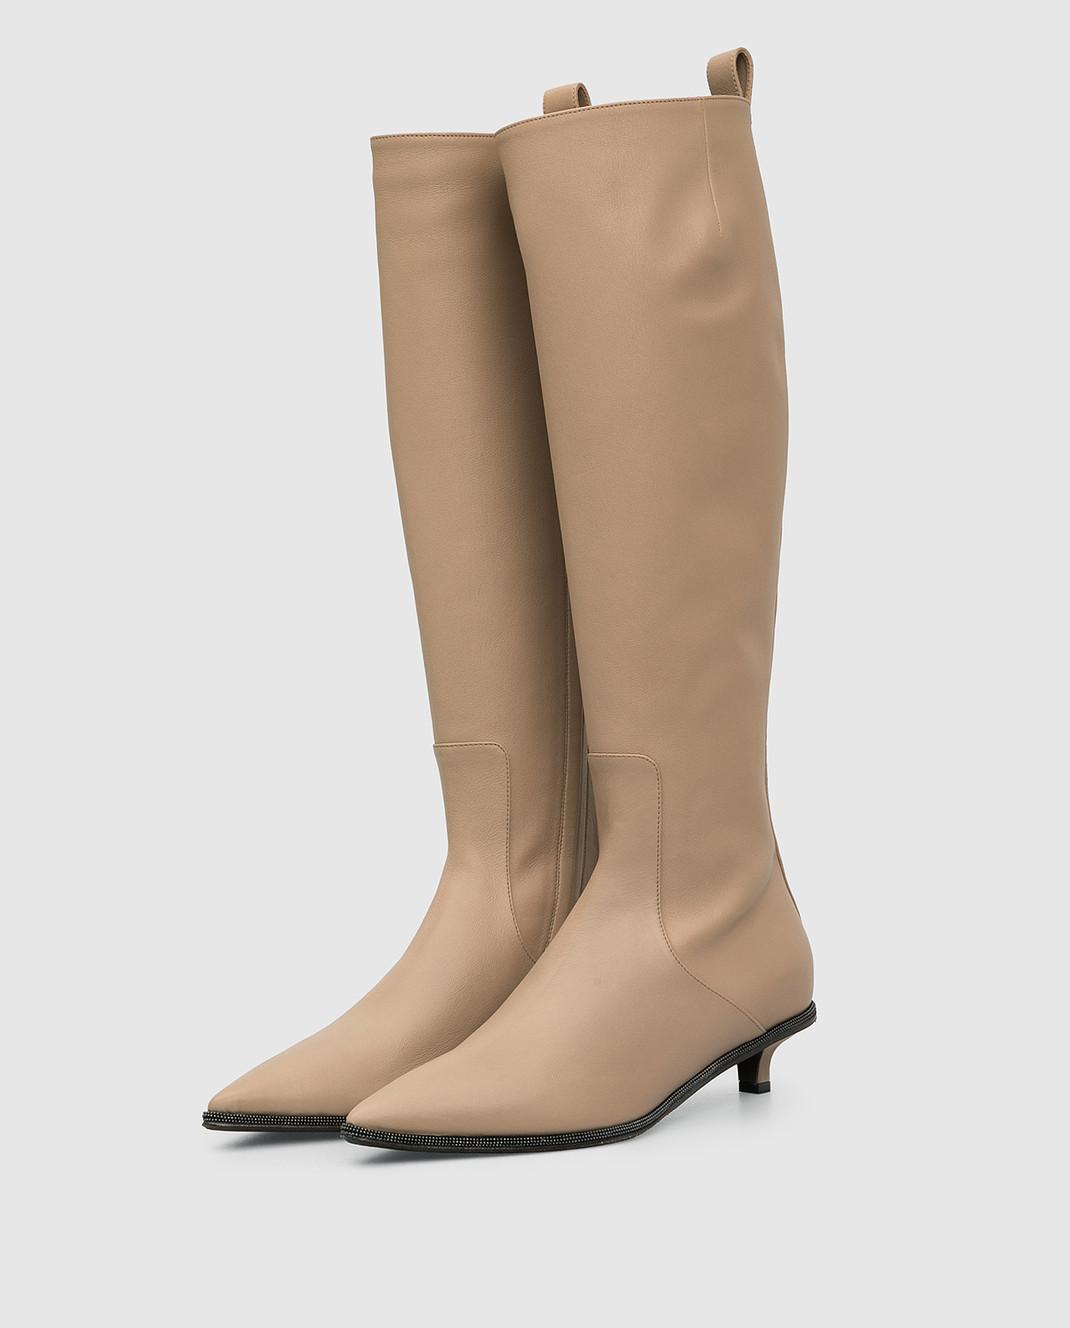 Brunello Cucinelli Бежевые кожаные сапоги изображение 3